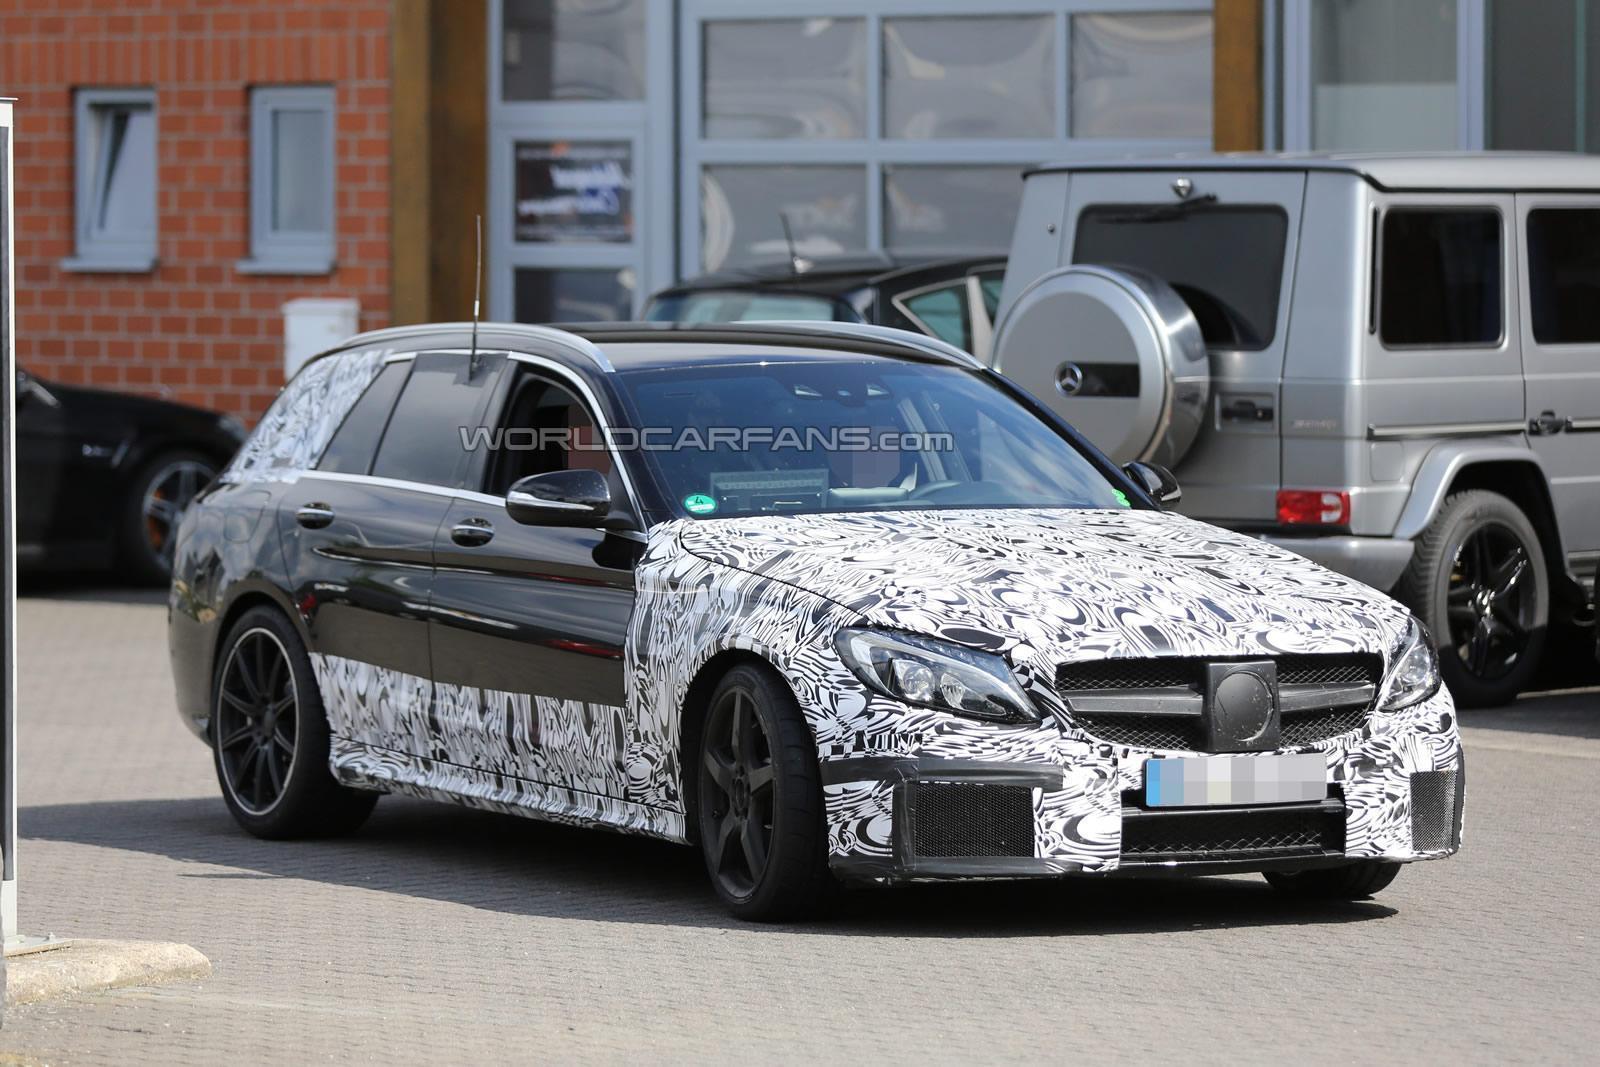 (S205): Protótipos da C63 flagrados em testes em Nürburgring C63-amg-estate-6-30-2